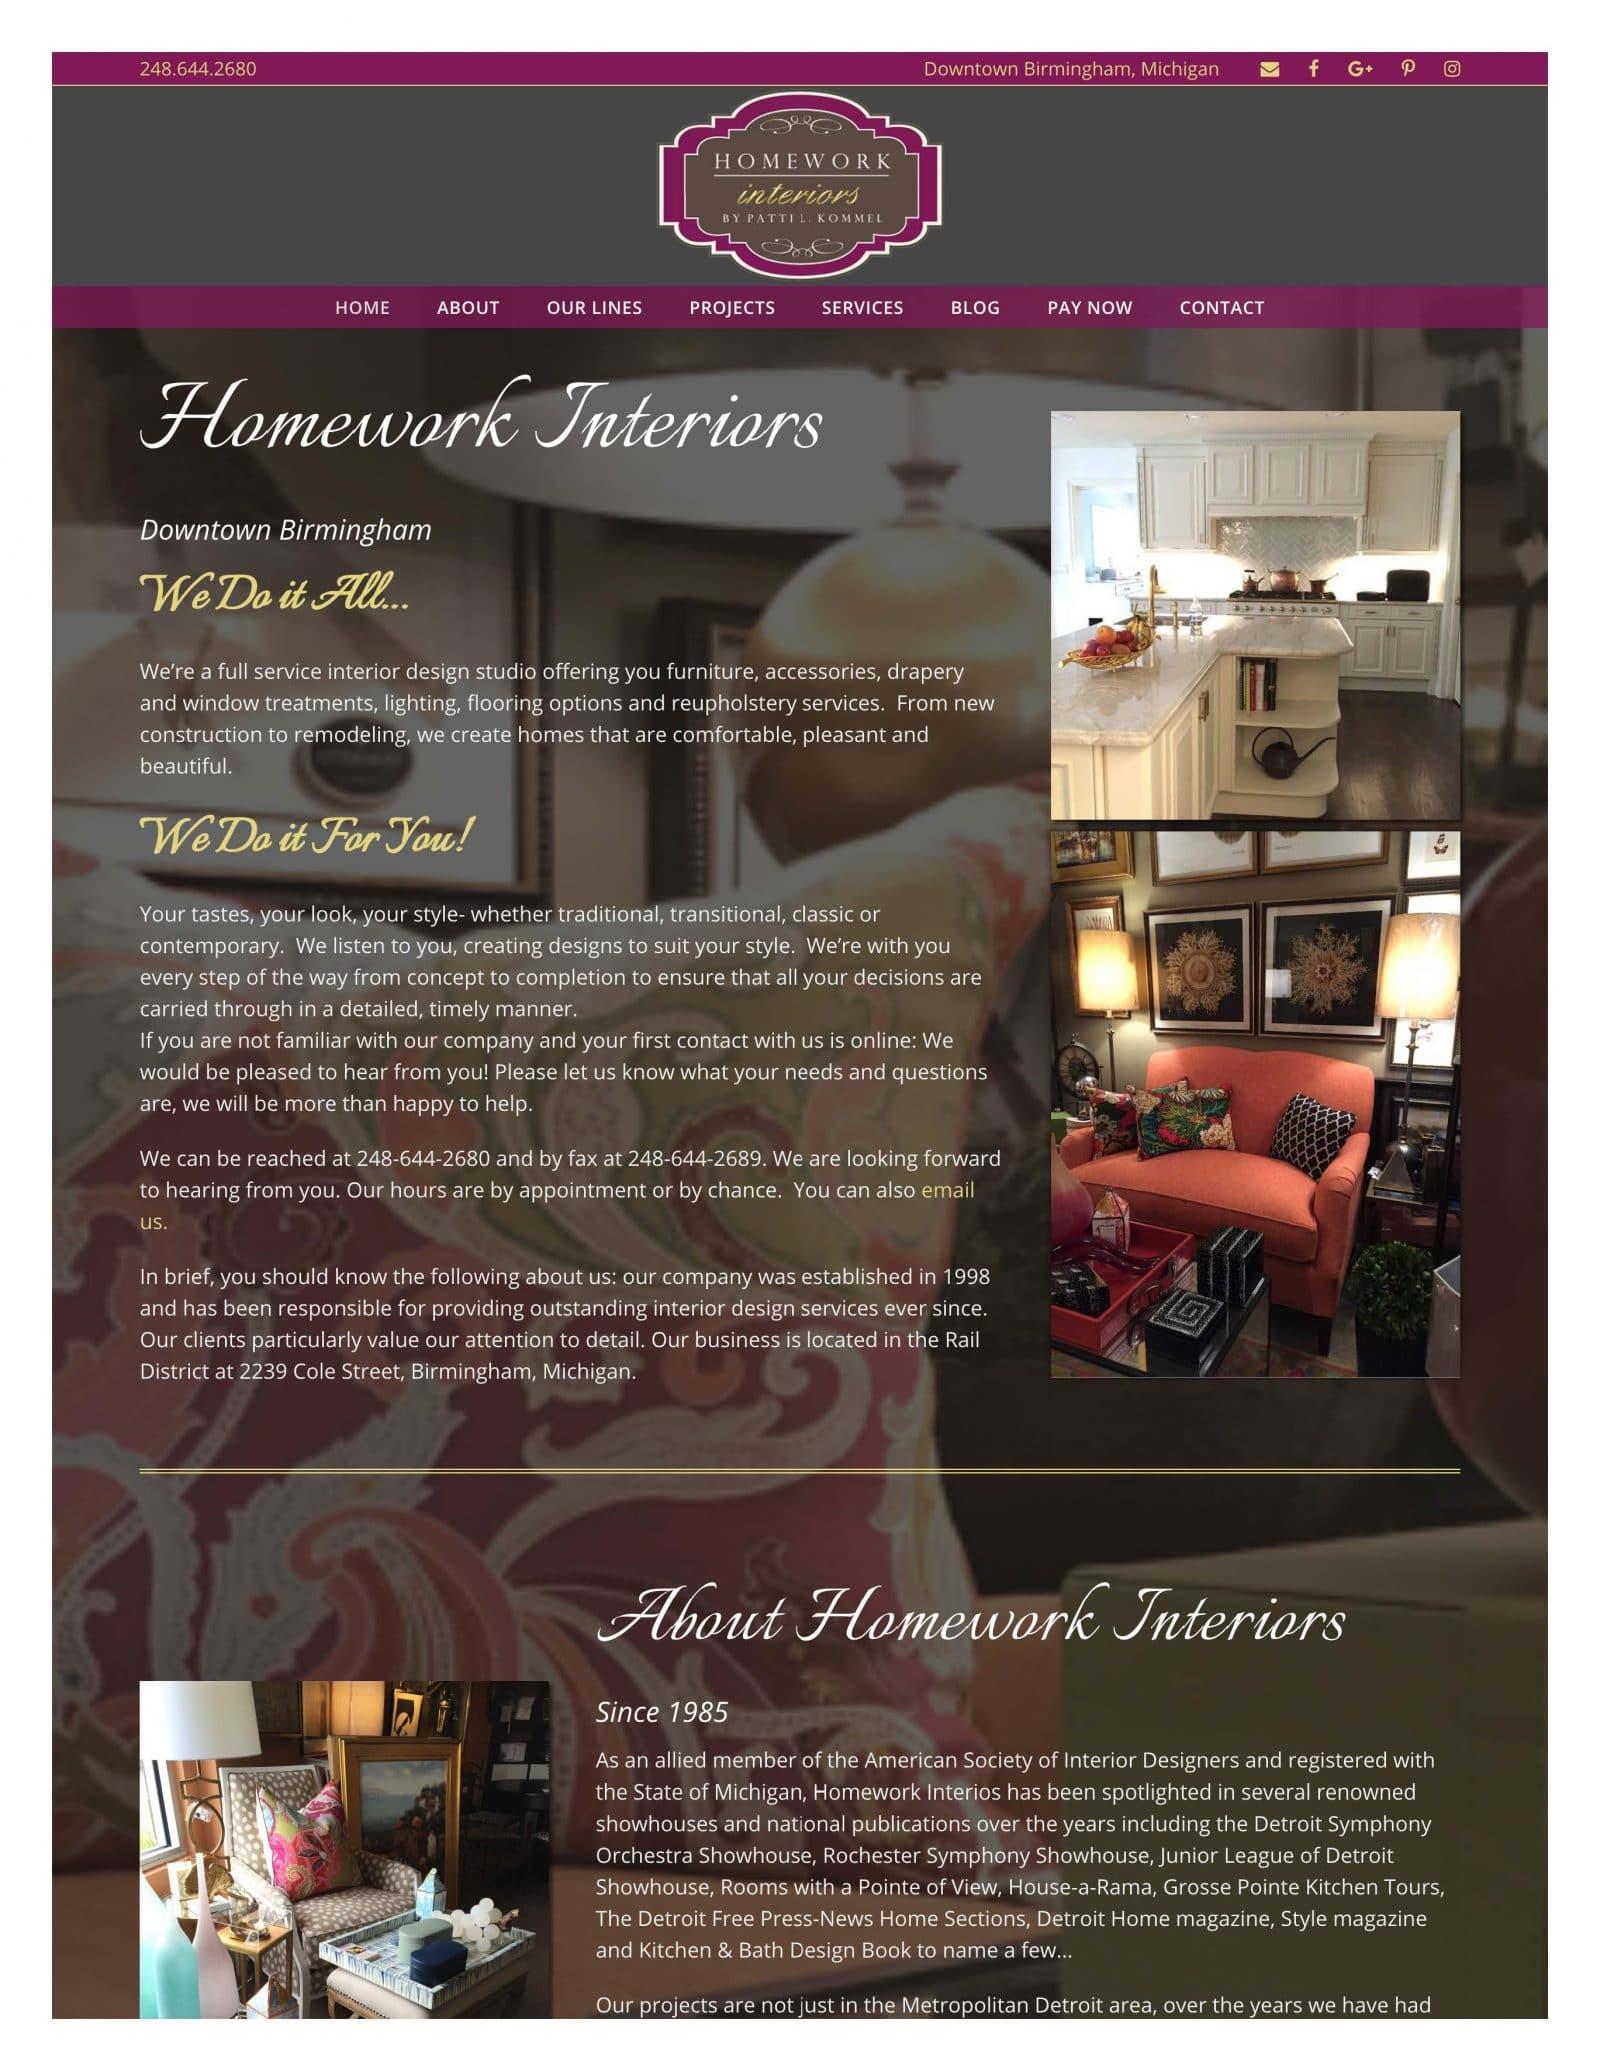 homework interiors